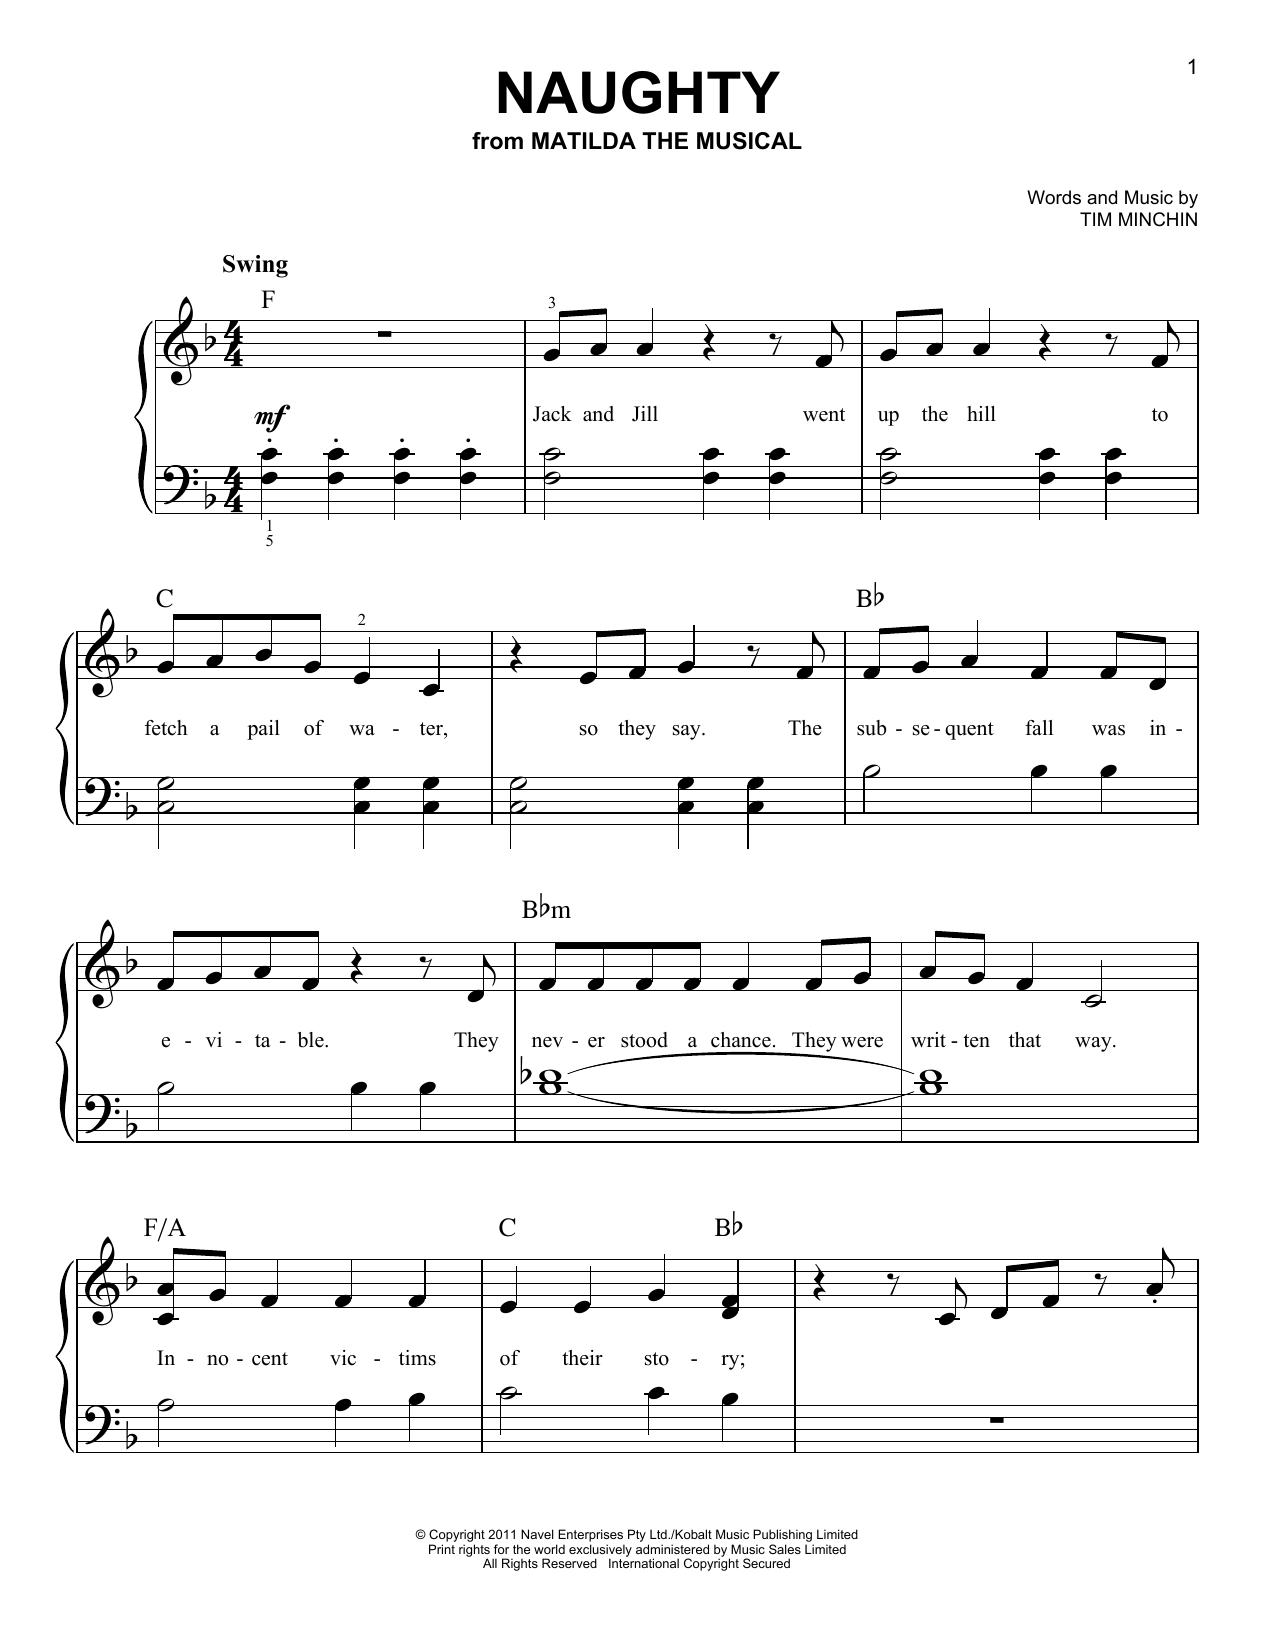 tim minchin piano tutorial